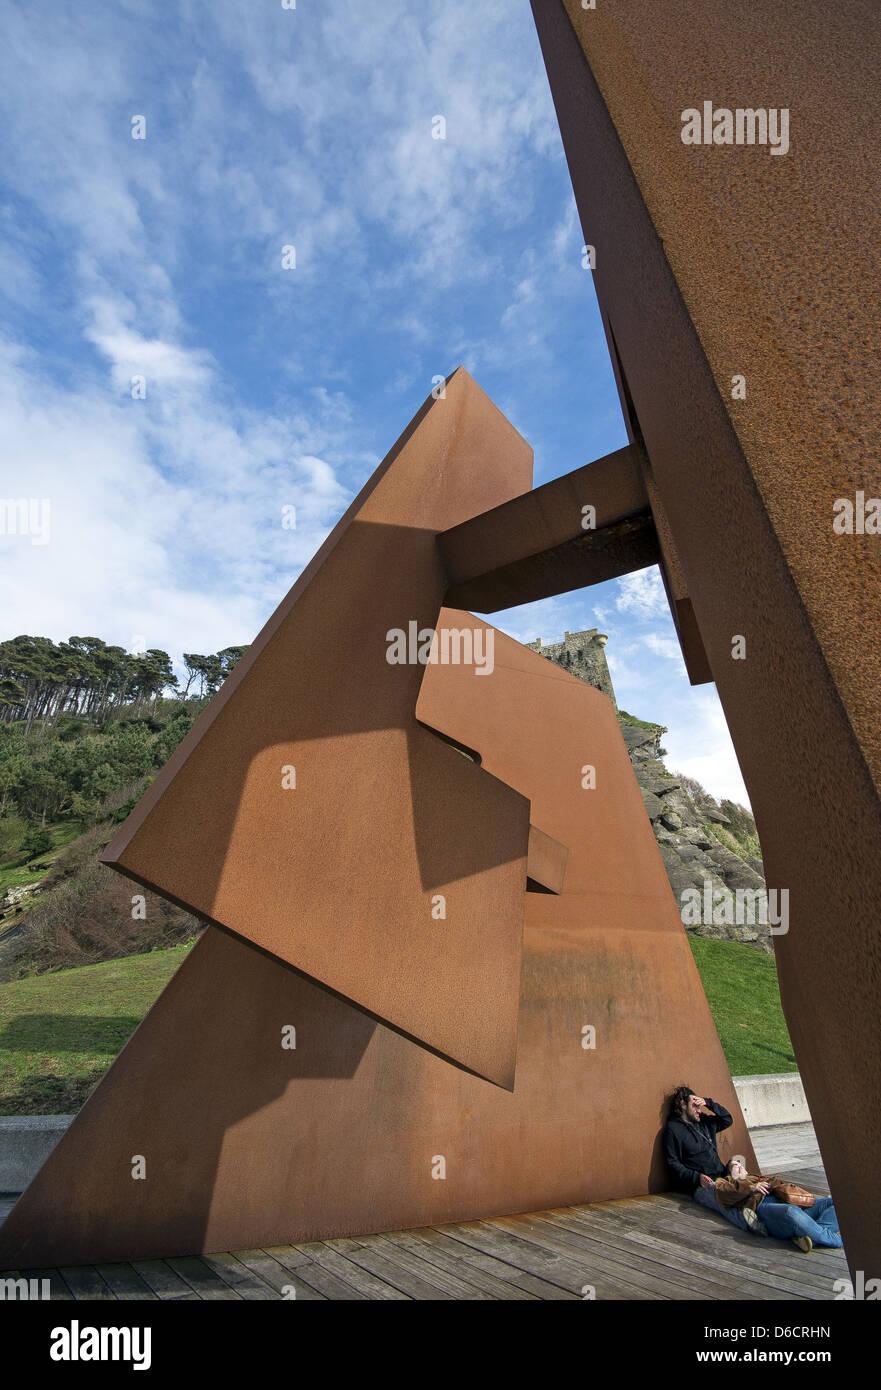 Sculpture on Paseo Nuevo promenade by Jorge Oteiza titled 'Void Construction' in San Sebastián, Donostia, - Stock Image